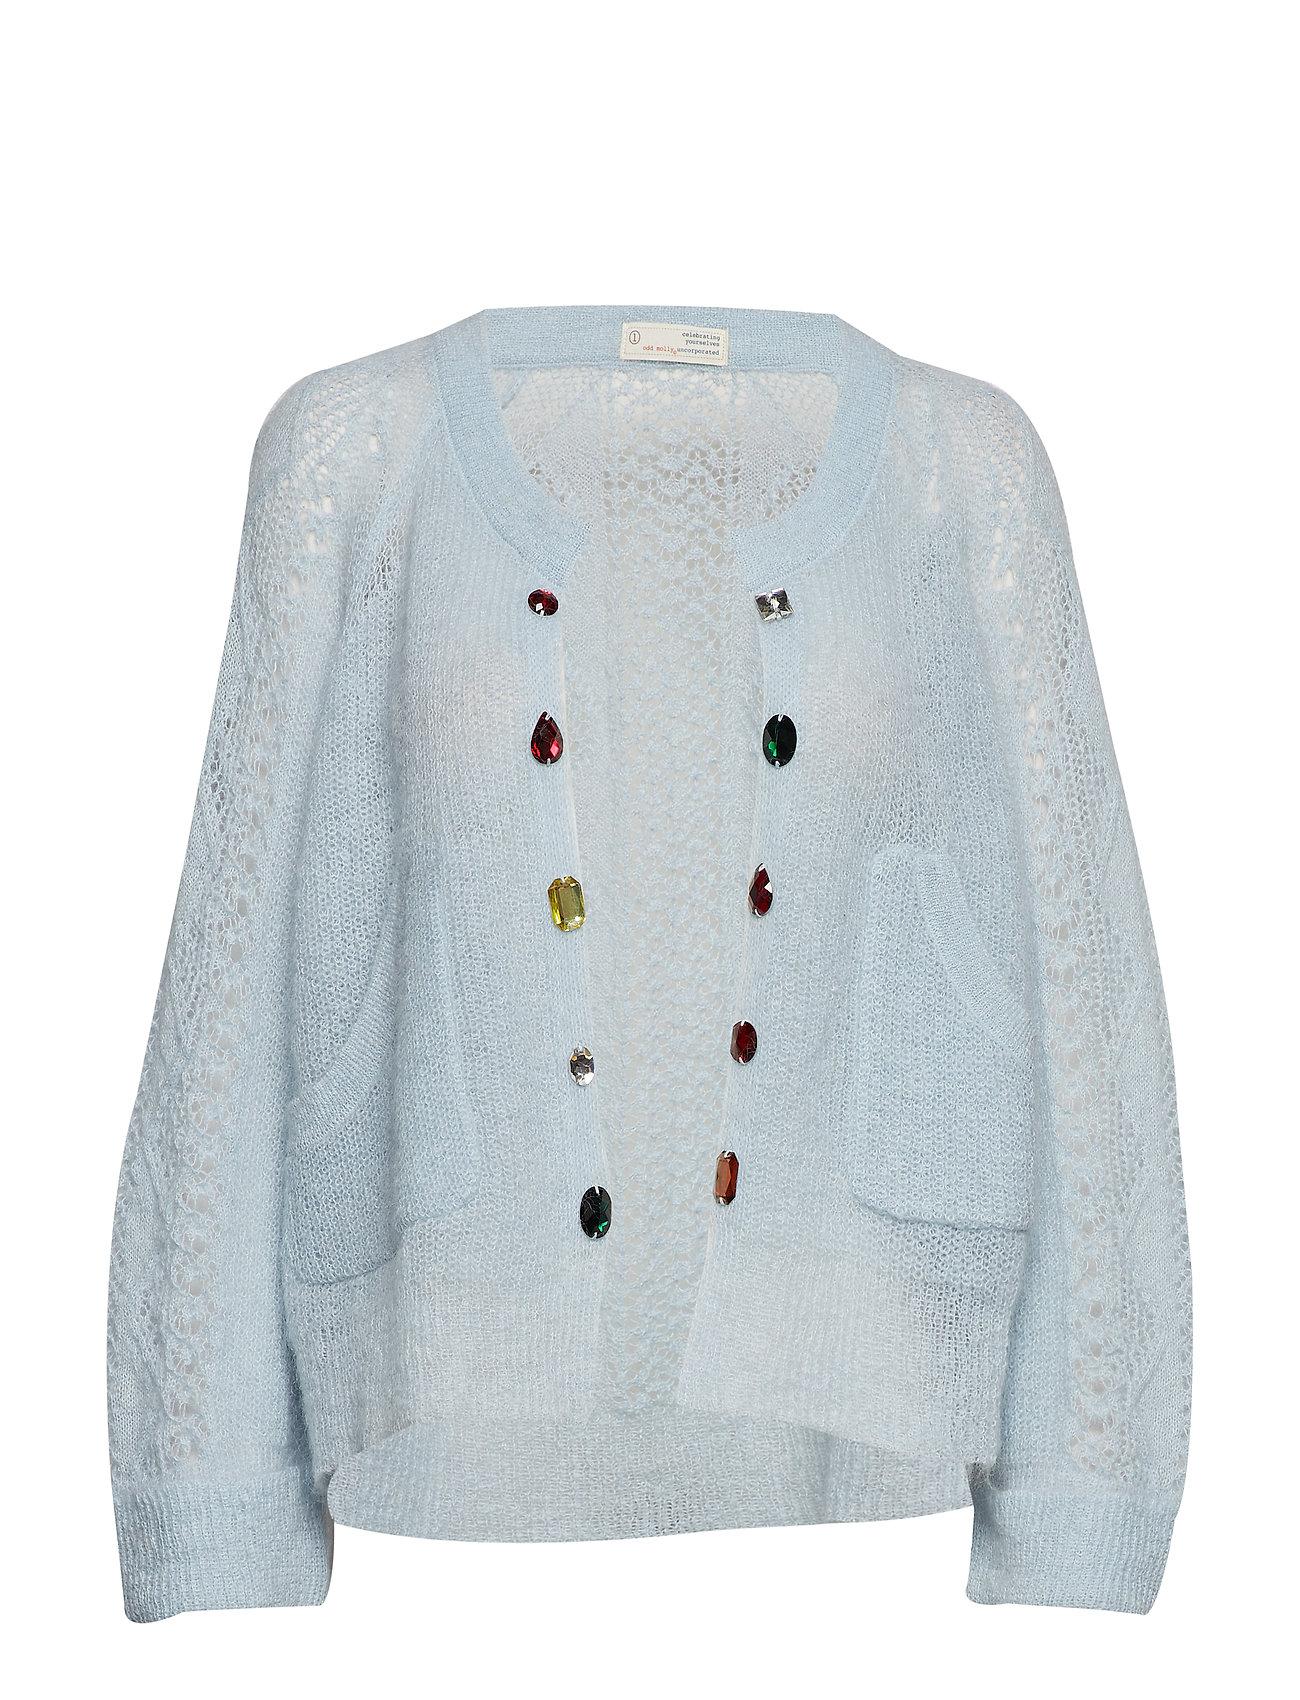 ODD MOLLY choice maker cardigan - AIR BLUE